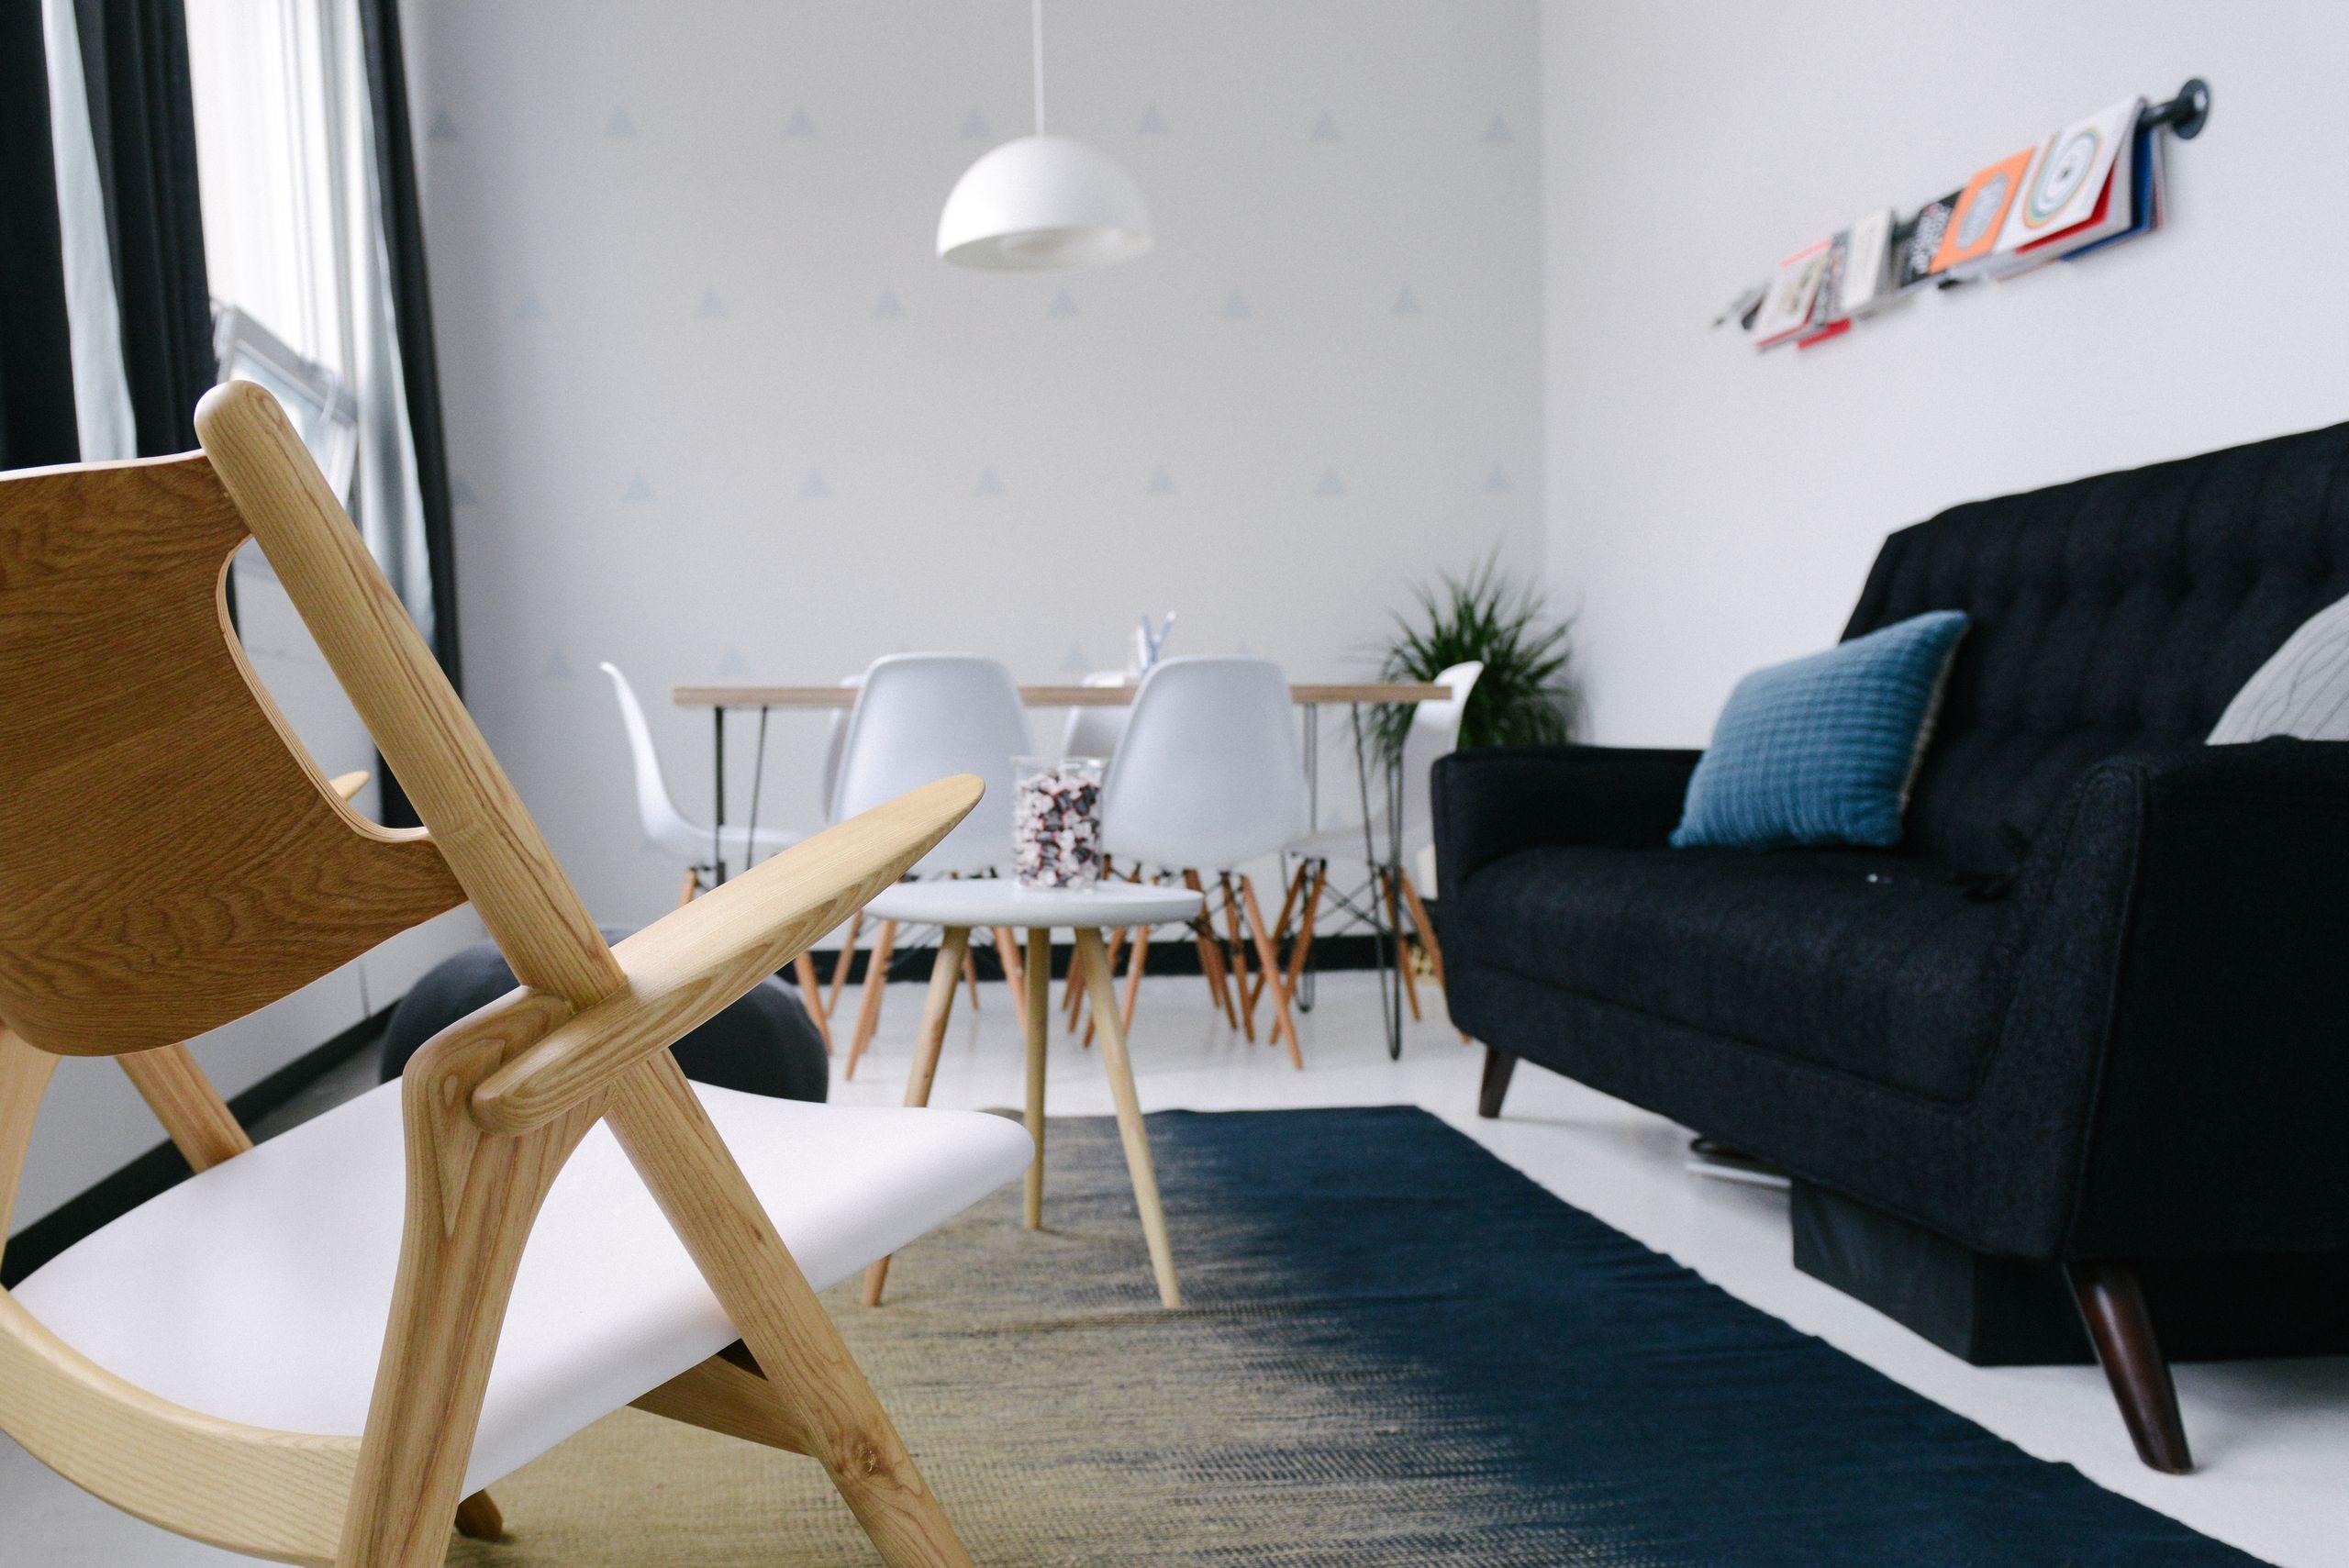 staging furniture